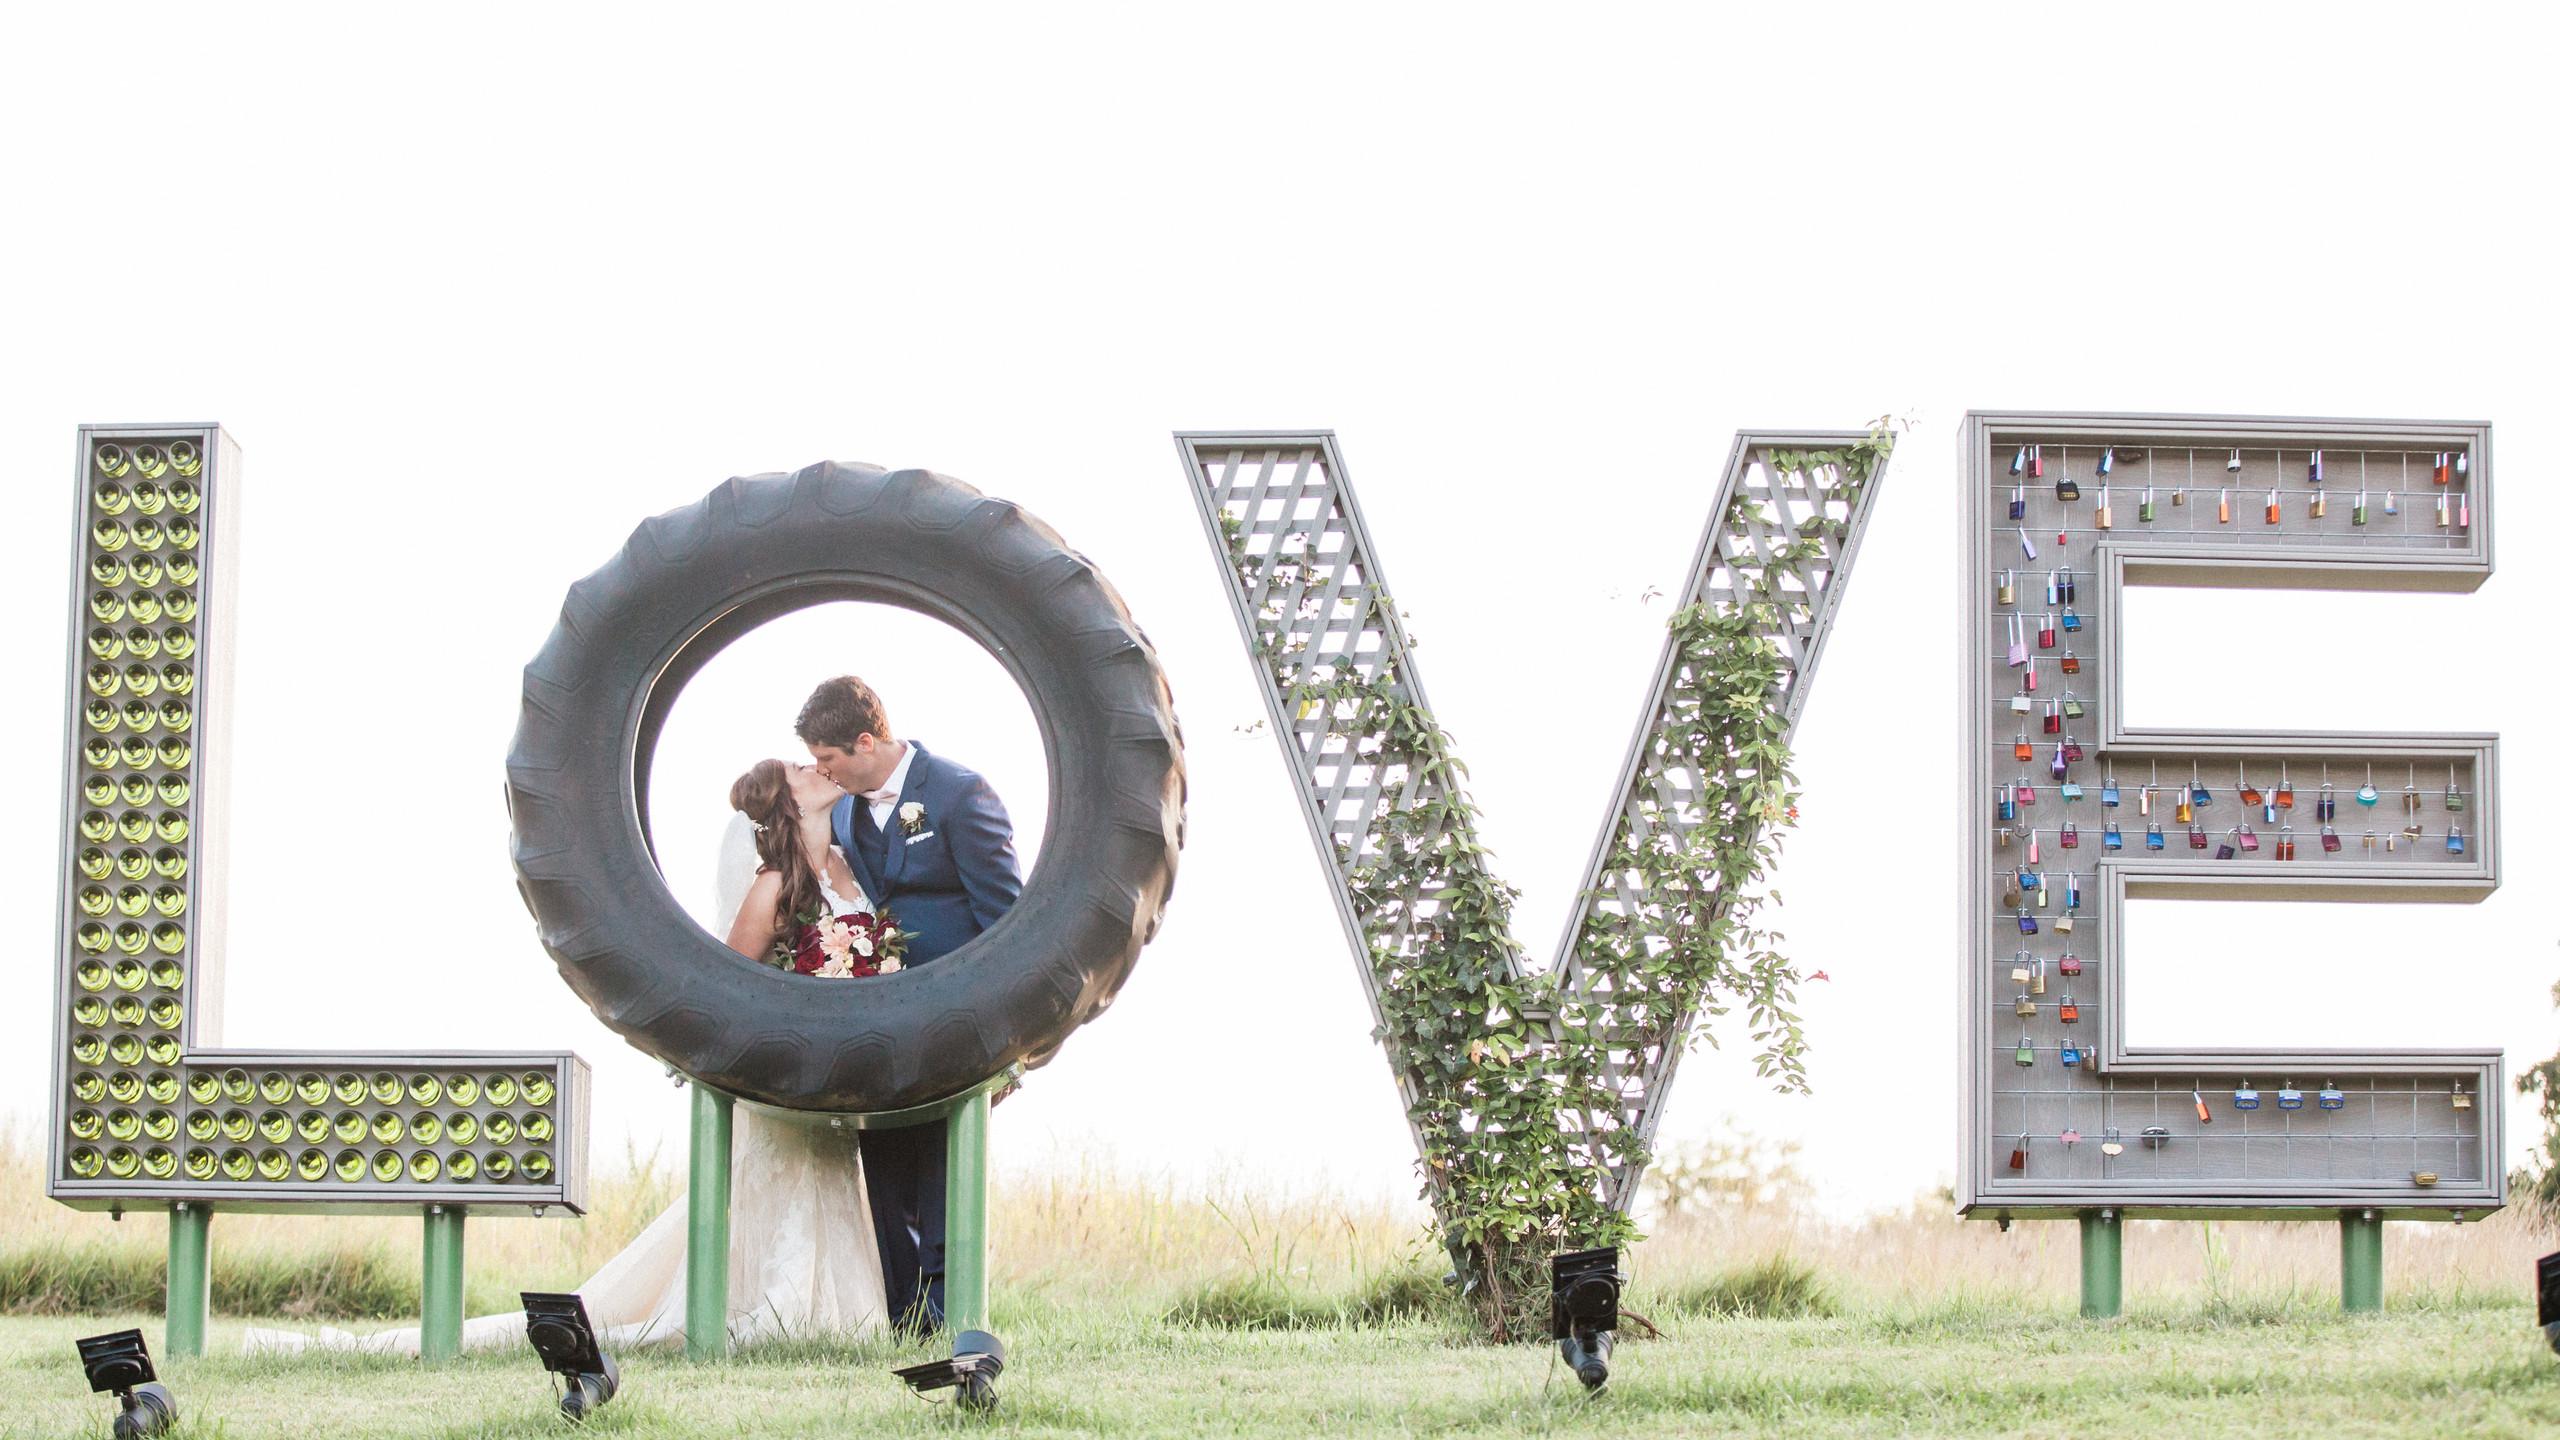 Photo by Amelia Lawrence Weddings - www.amelialawrenceweddings.com